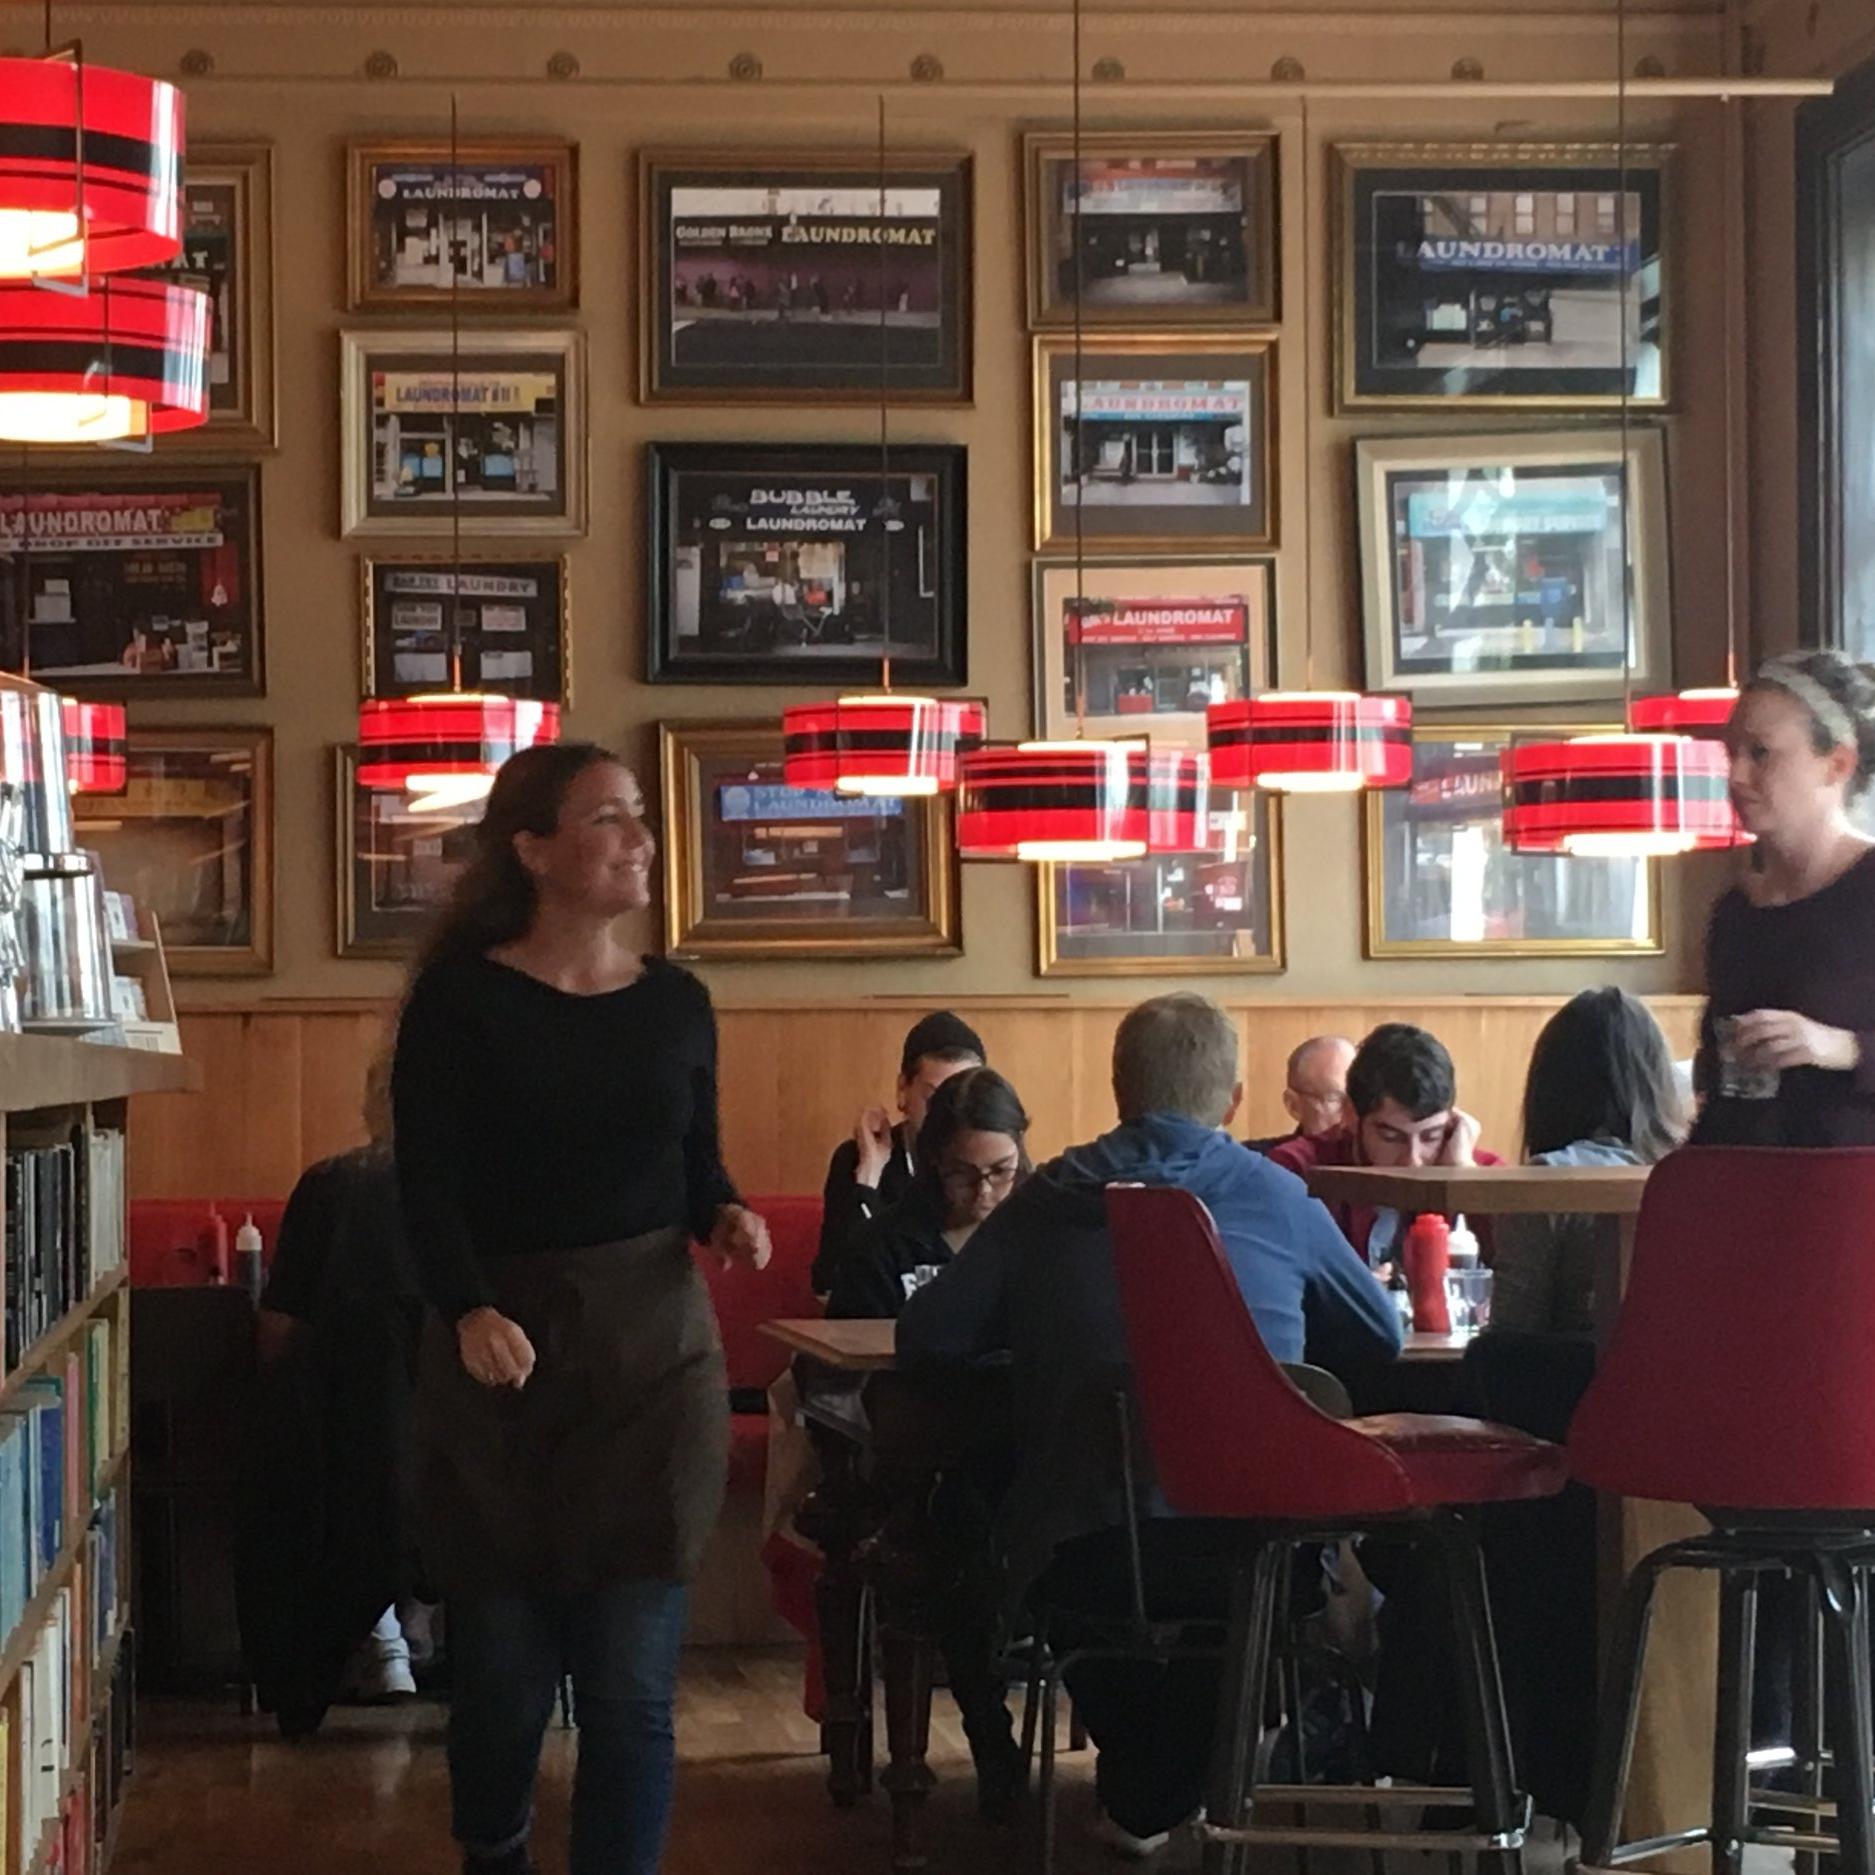 Laundromat, Reykjavik by The Doubtful Traveller